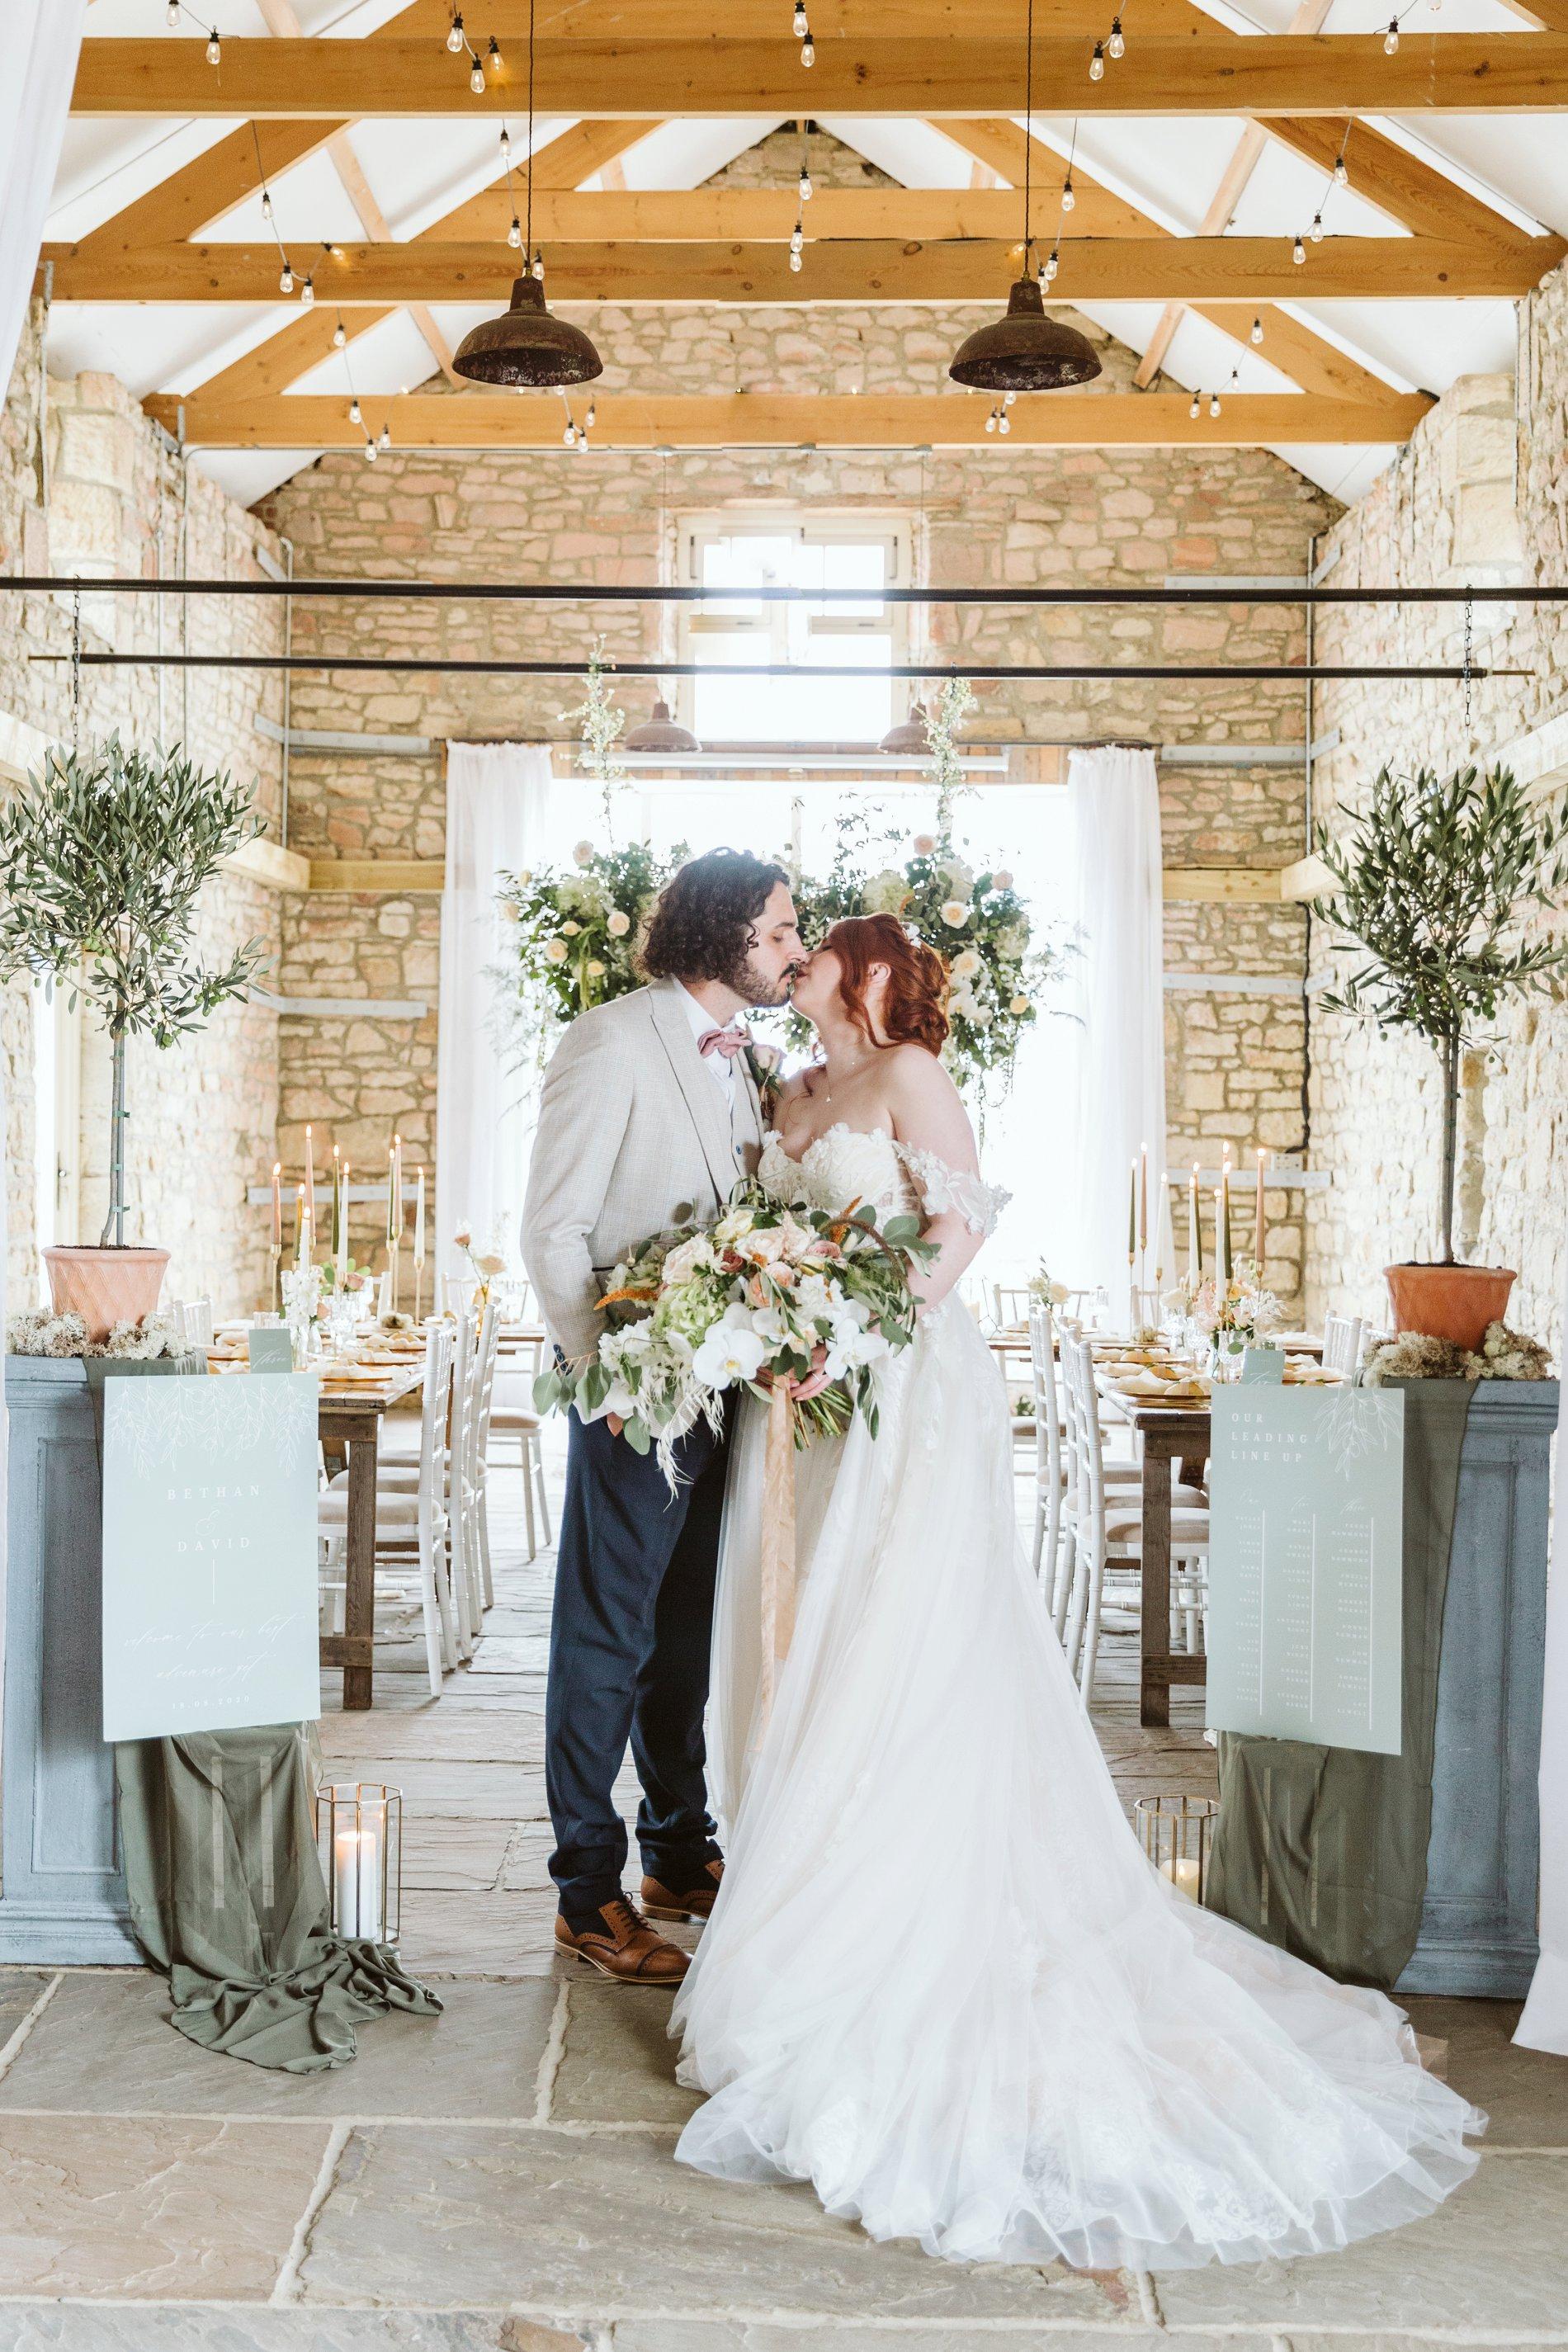 Saying I Do Rustic Wedding Creative Shoot (c) Charlotte Eve Photography (26)